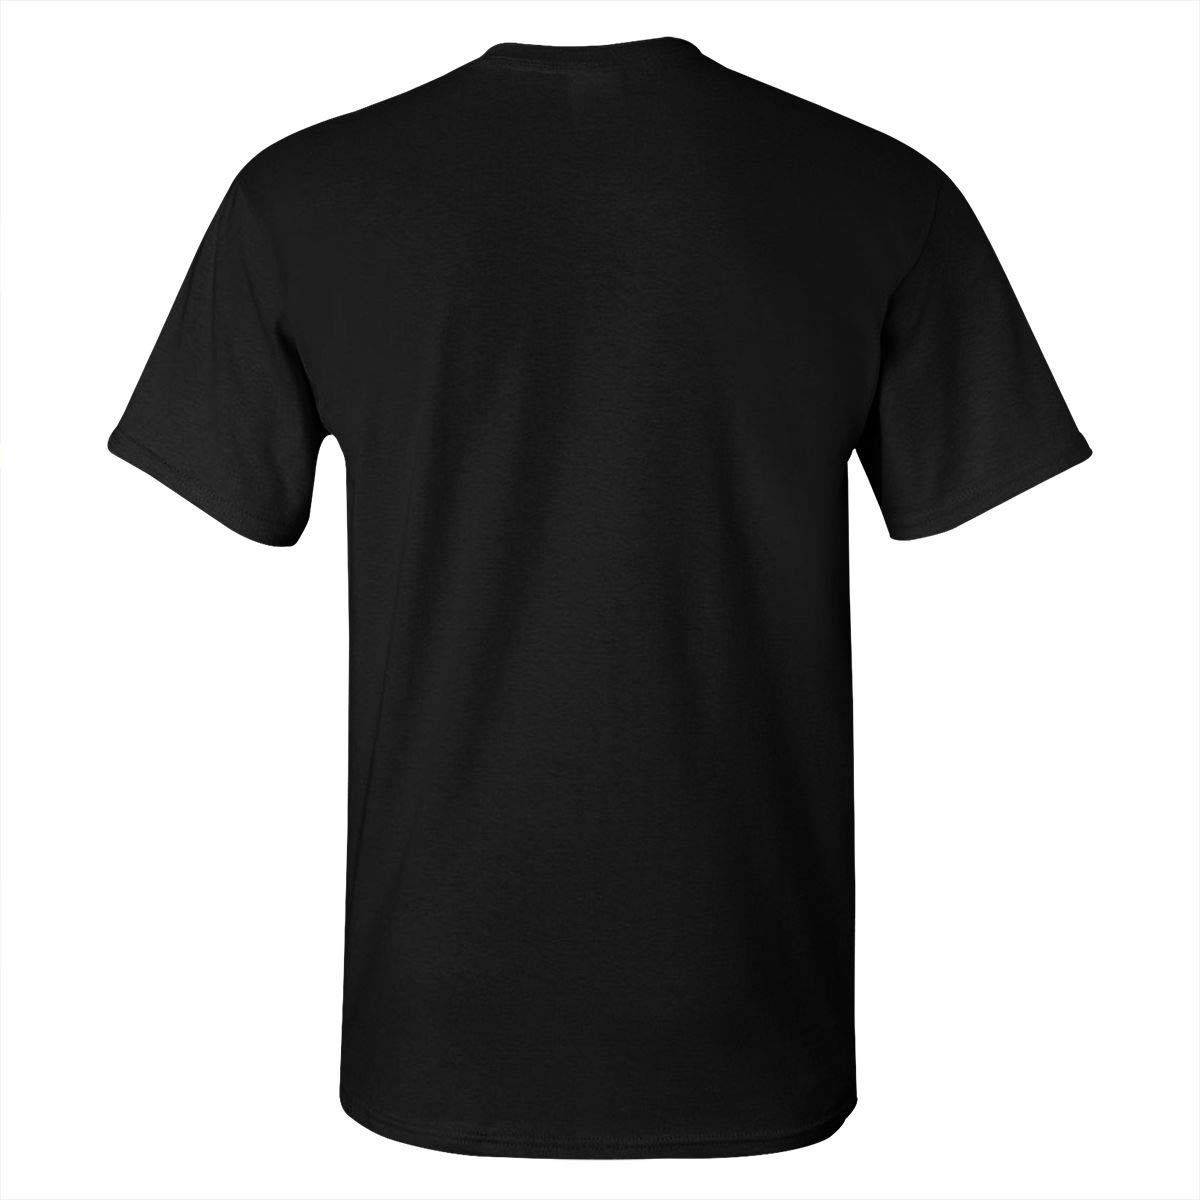 Adult Women Men Cotton Love is Love Gay Pride Tee T-Shirt Black